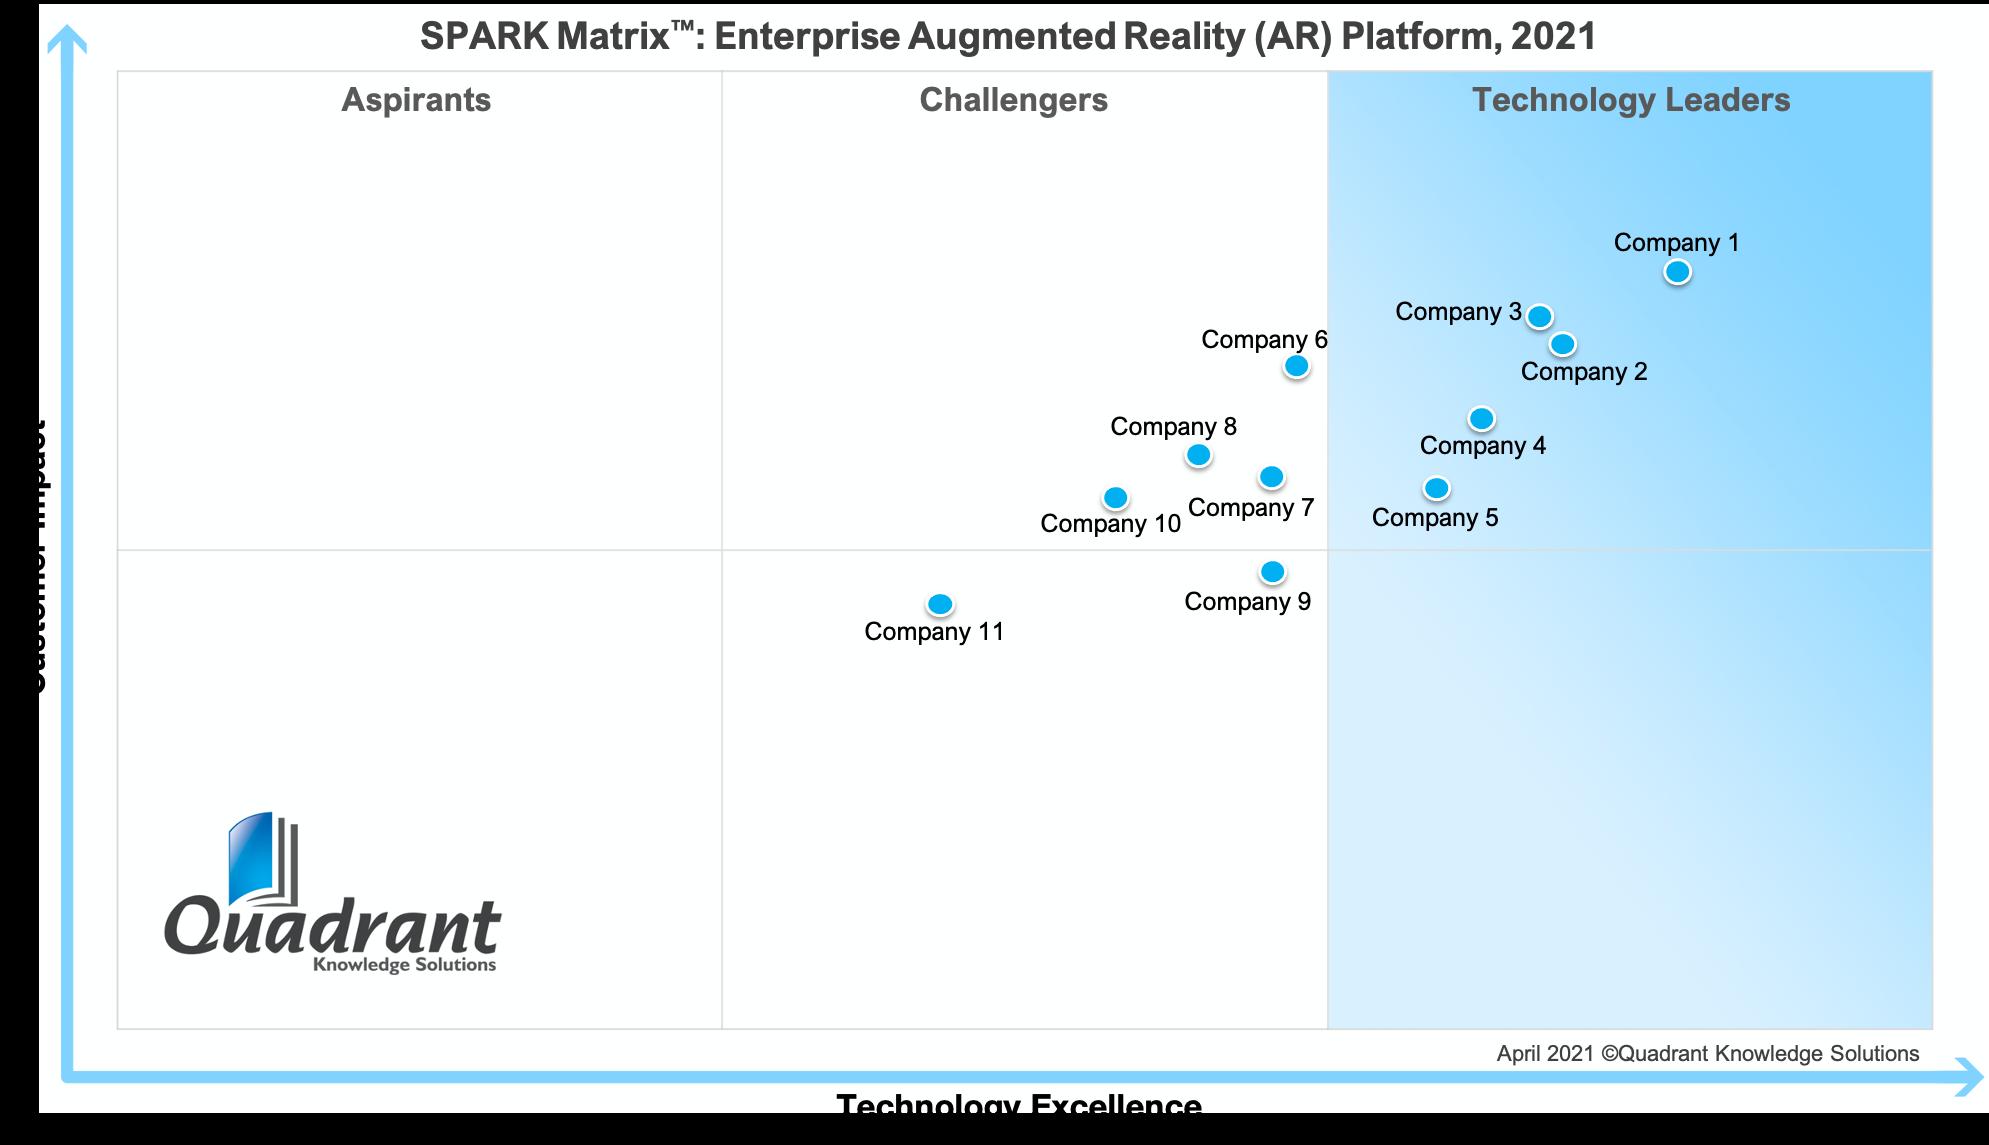 2021 SPARK Matrix-Enterprise Augmented Reality (AR) Platform-Quadrant Knowlege Solutions